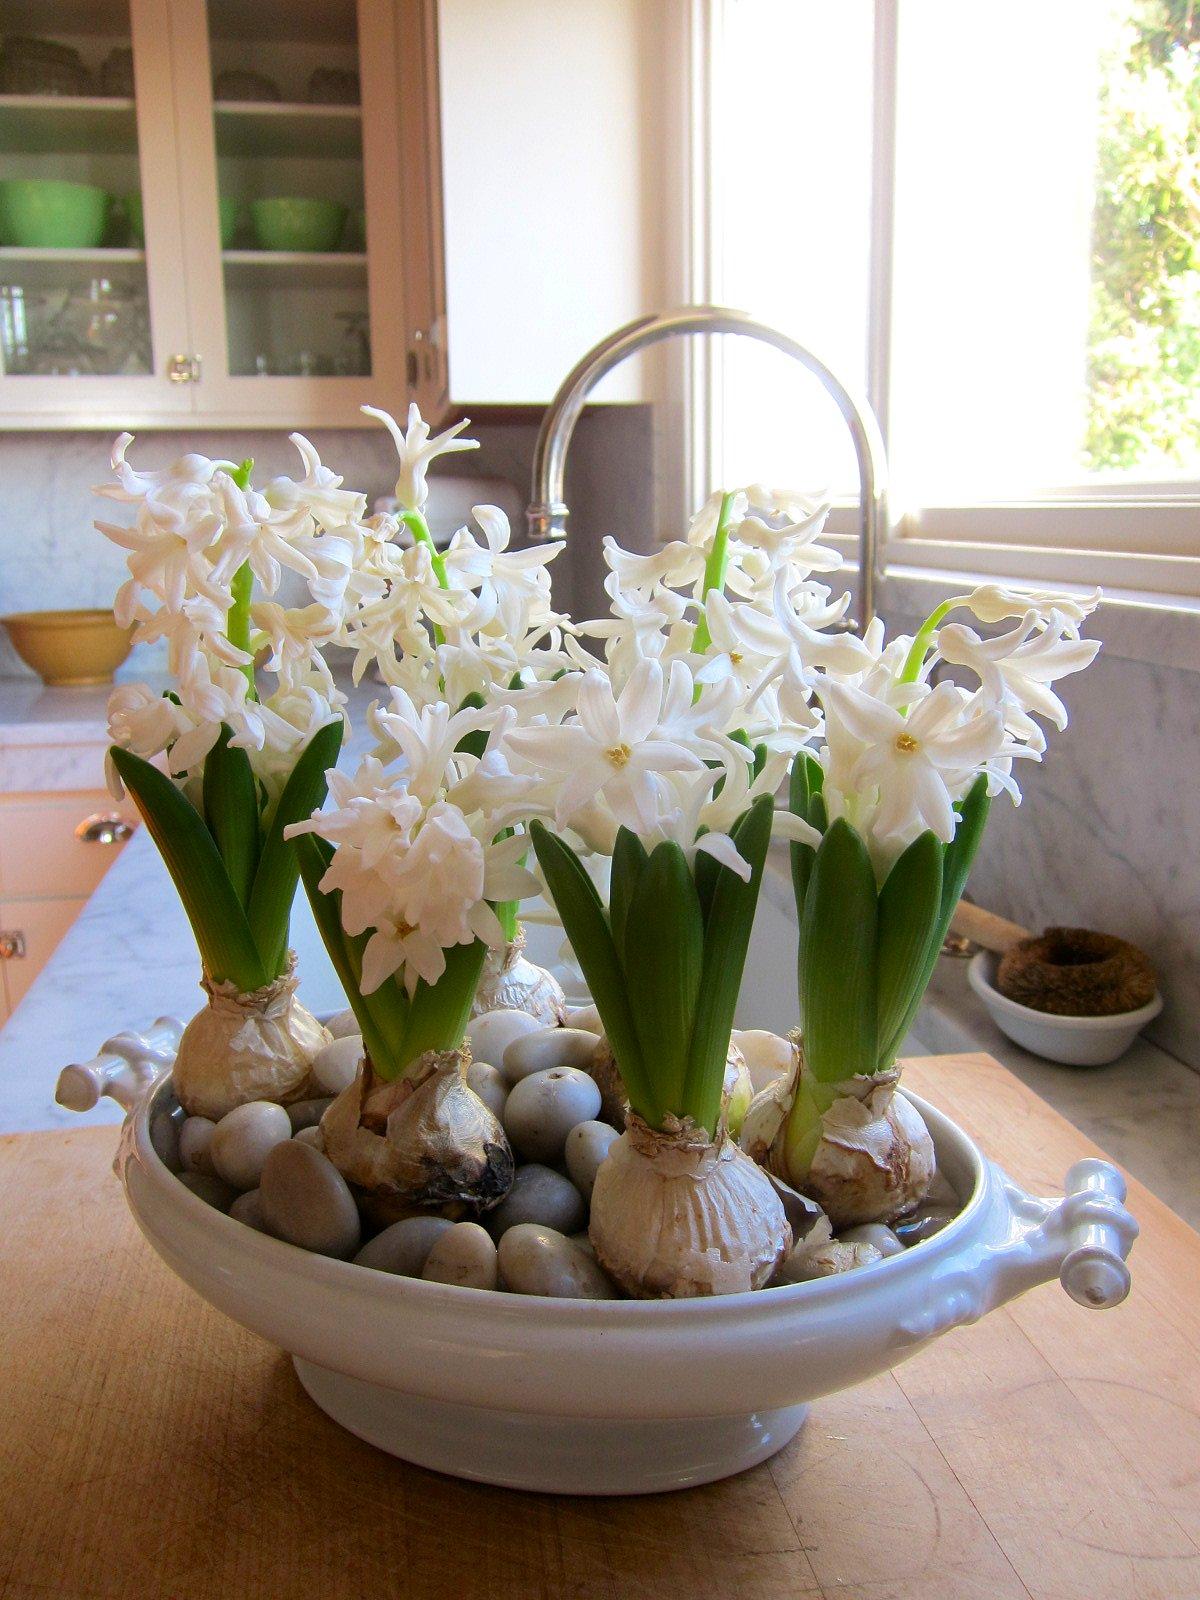 Chronica domus the sweet smell of hyacinths a diminutive hyacinth reviewsmspy